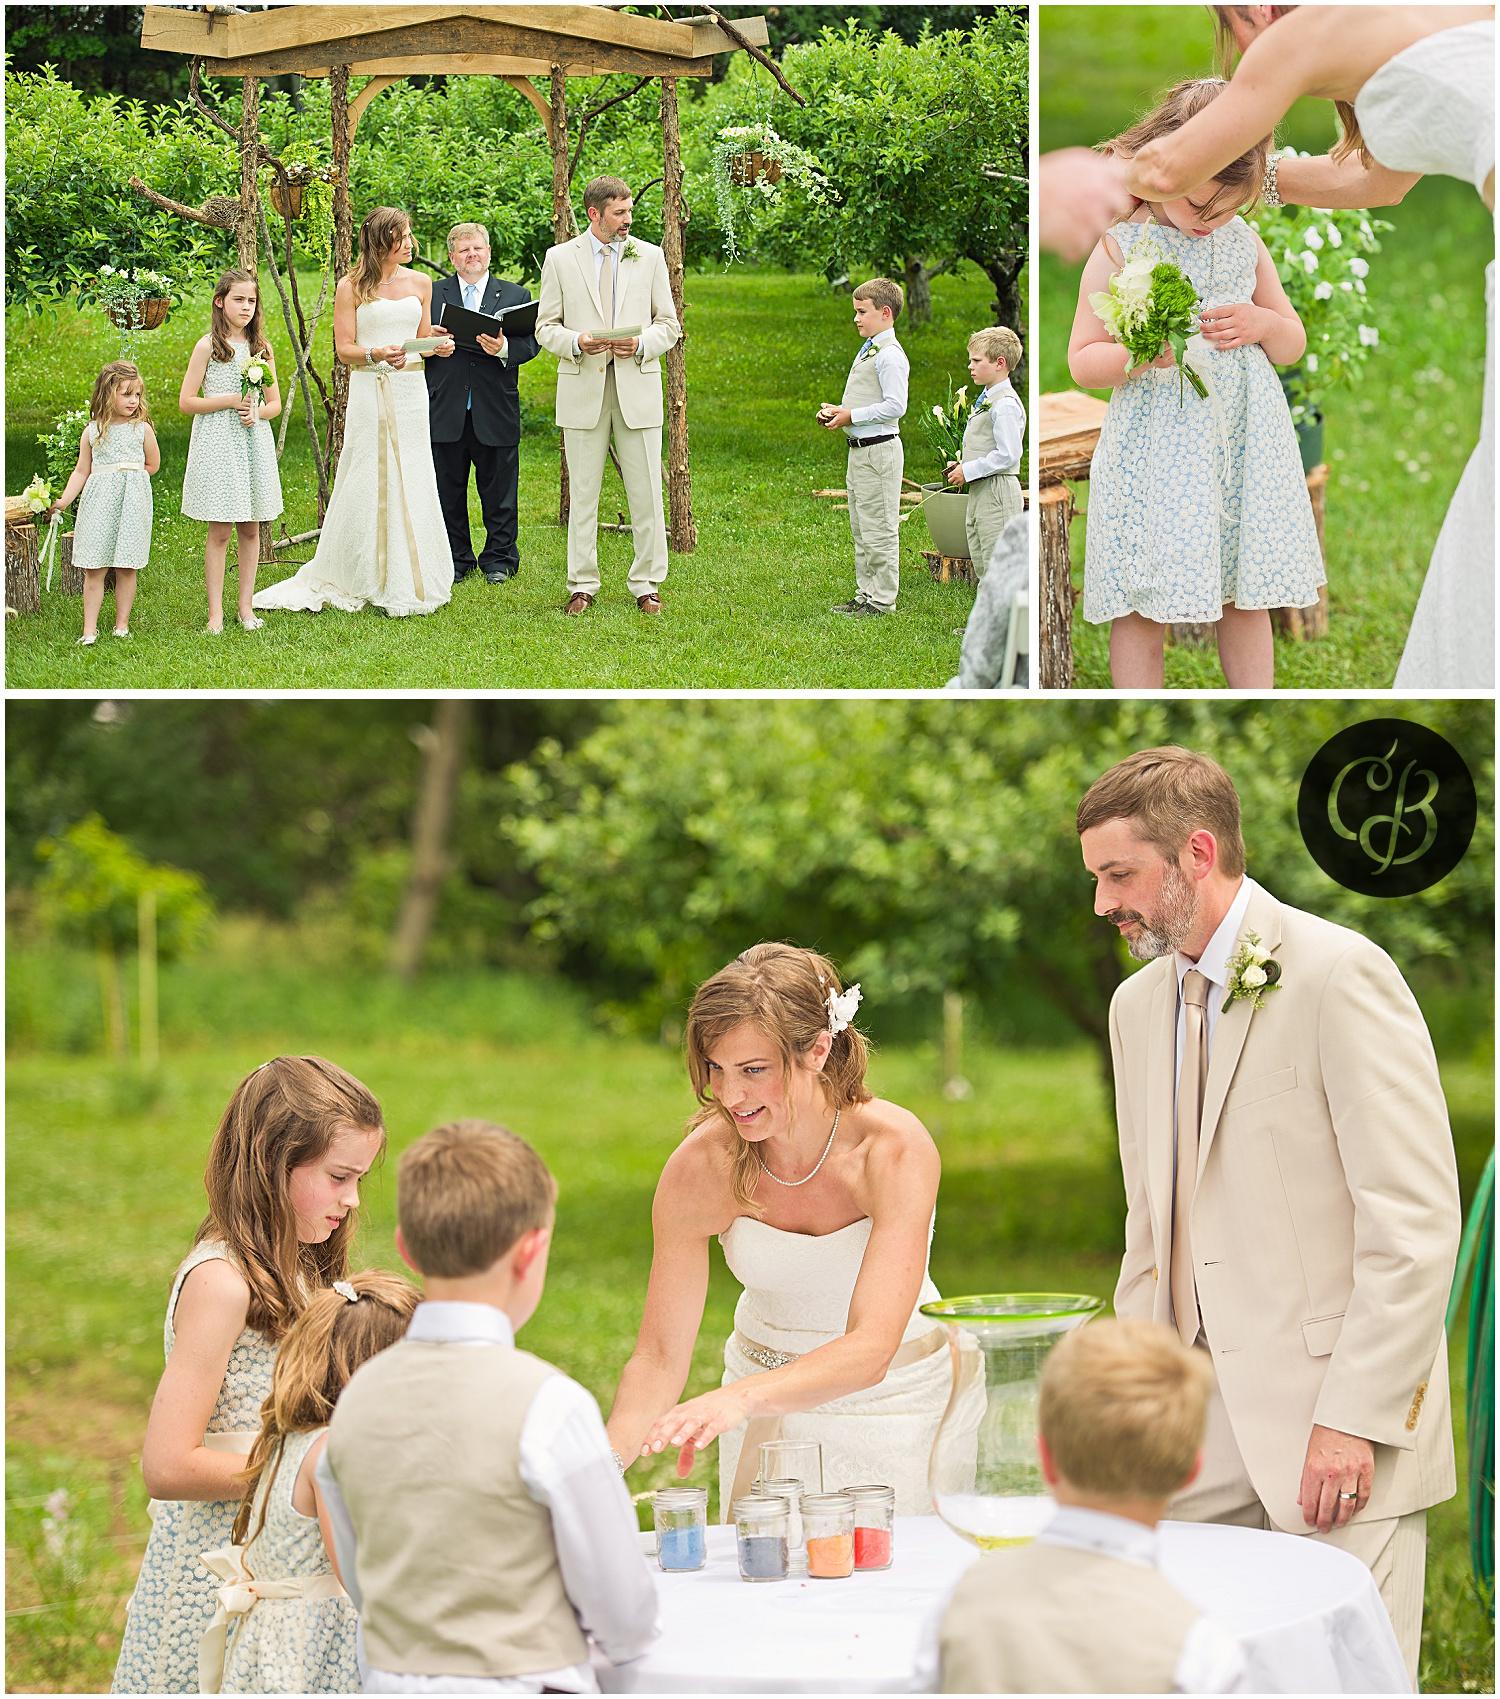 Sandhill-Crane-Winery-Wedding_0149.jpg